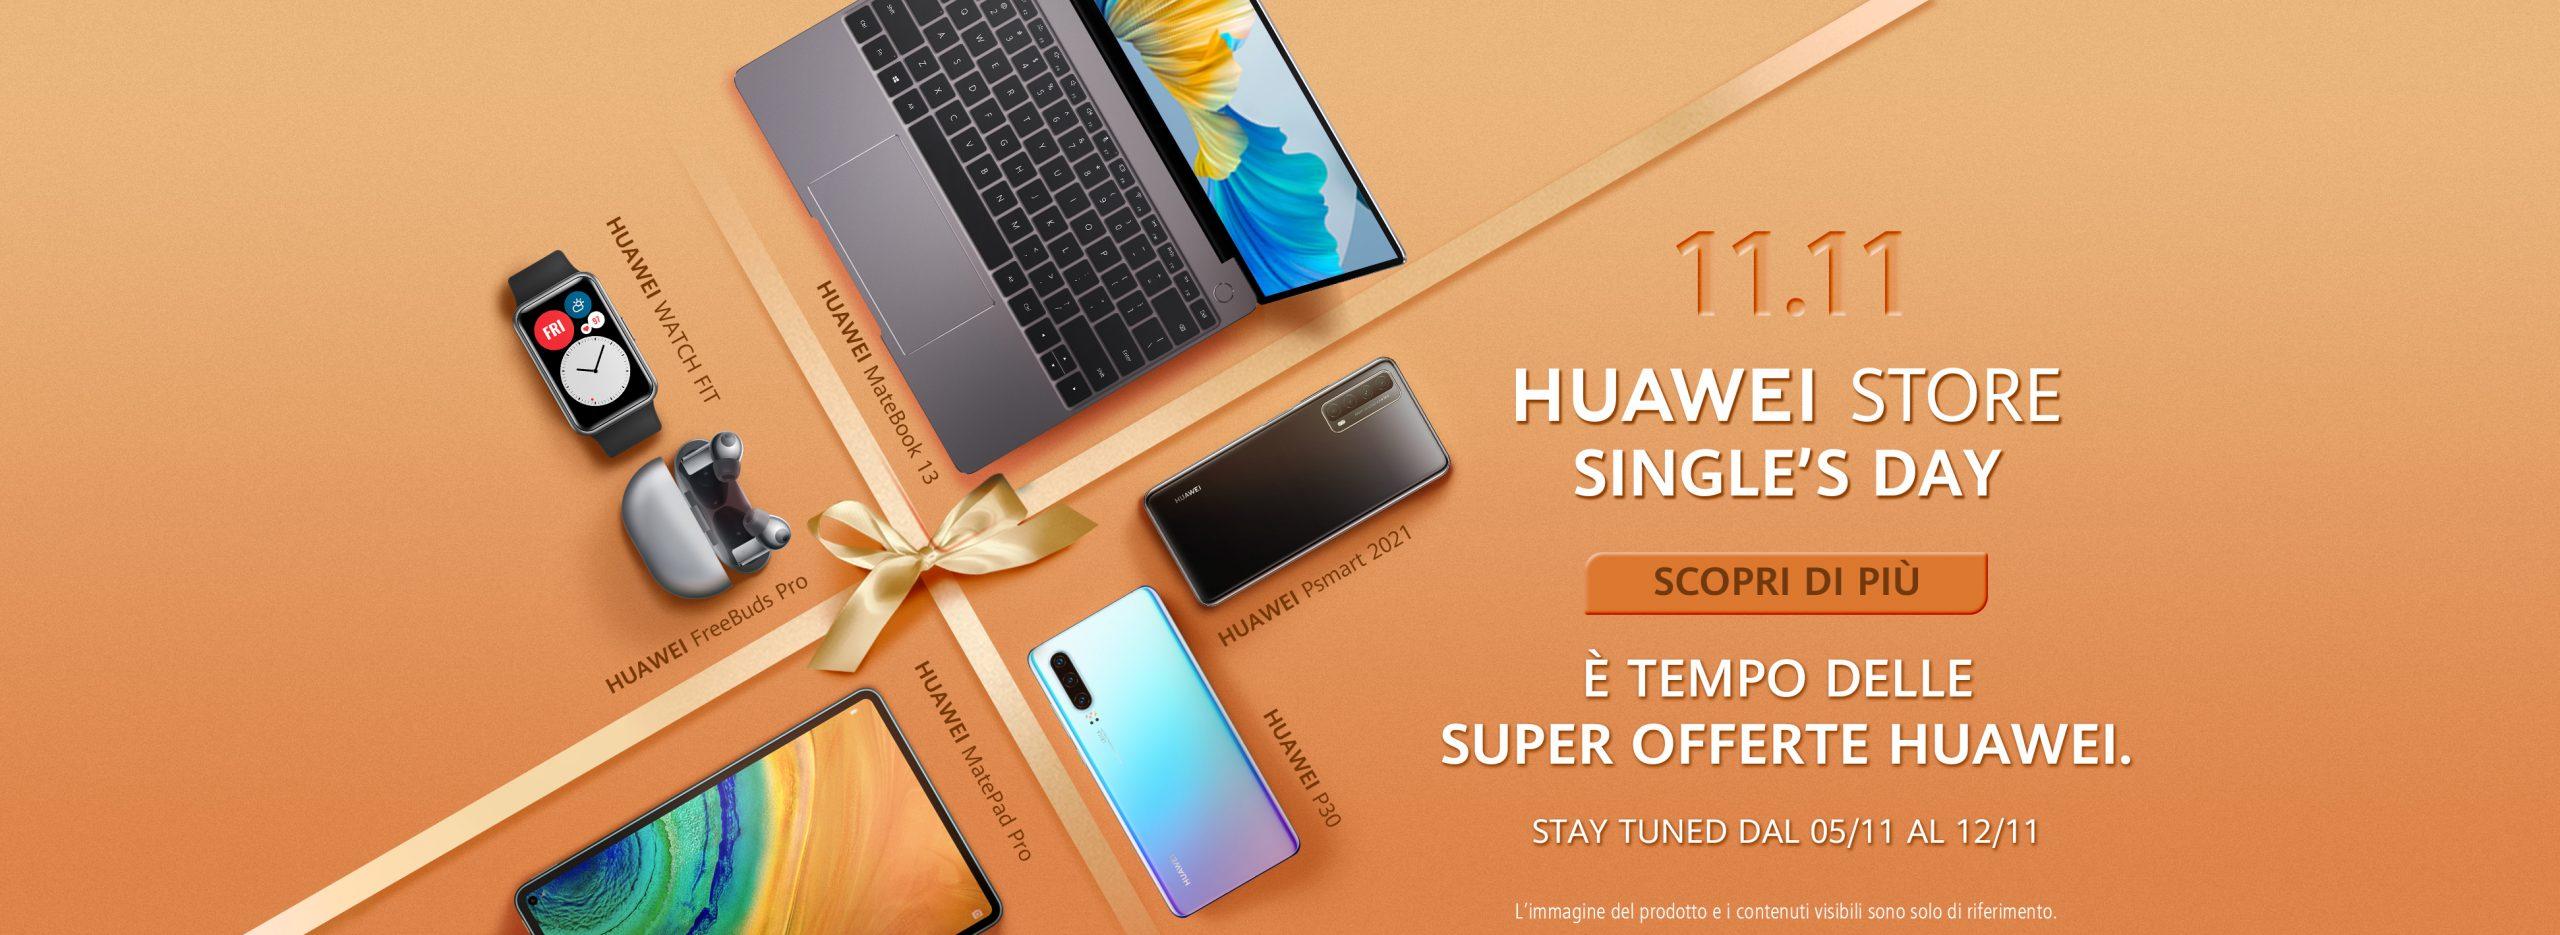 Huawei Store Single Day Promo - 11-11-2020